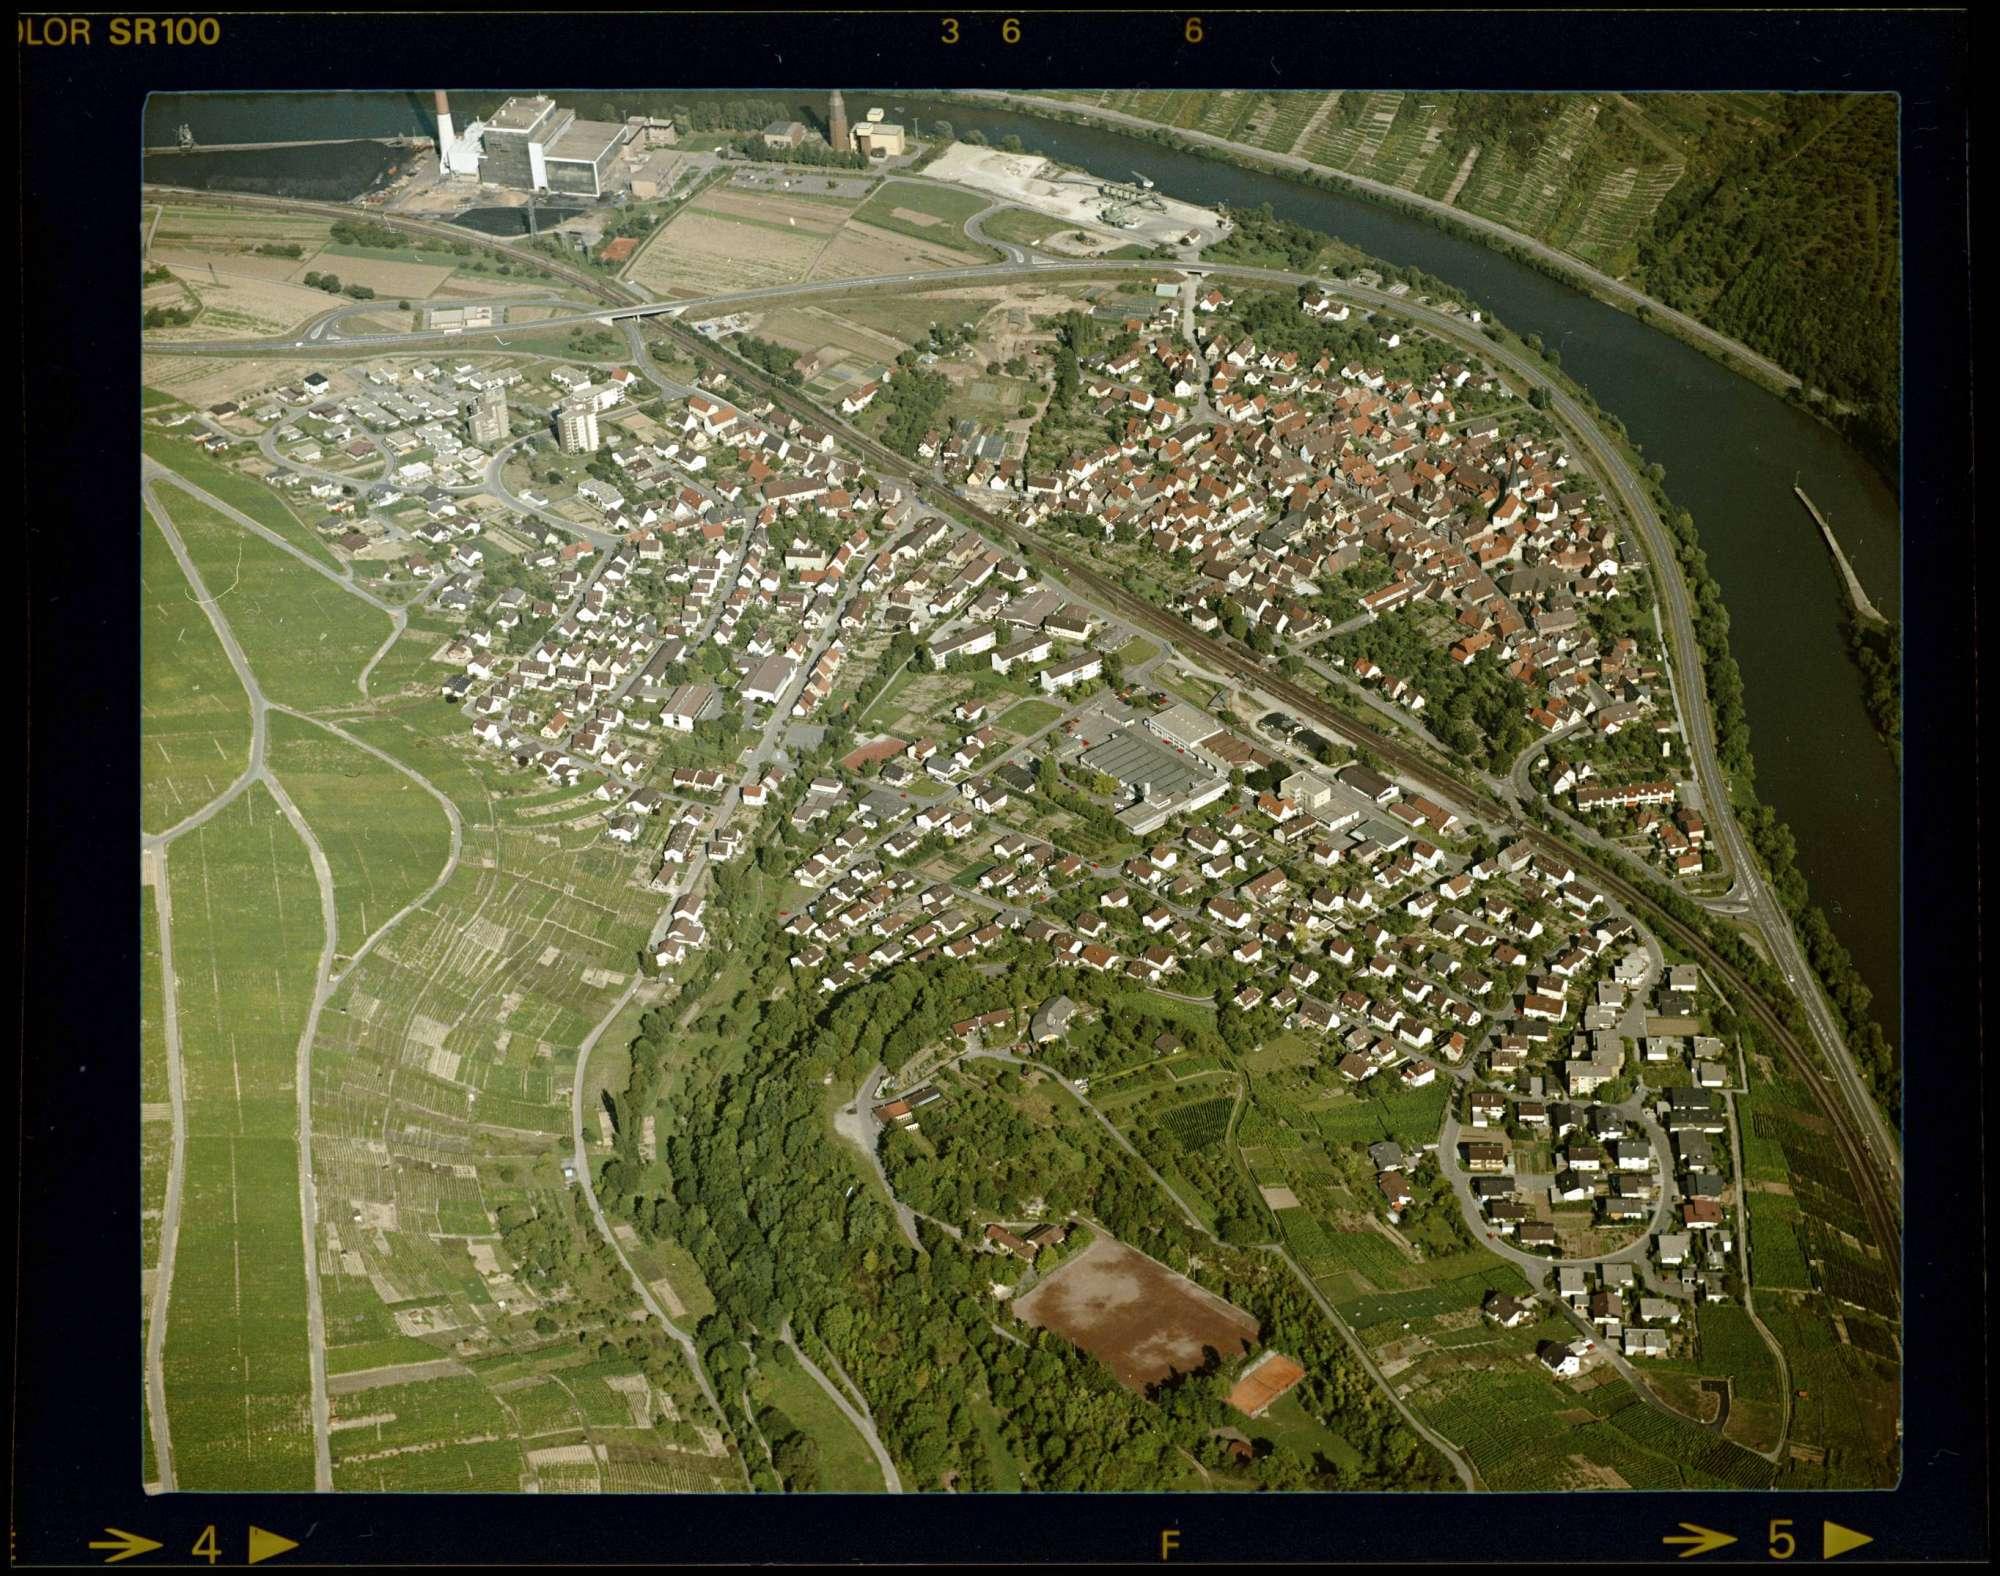 Walheim, Luftbild, Bild 1